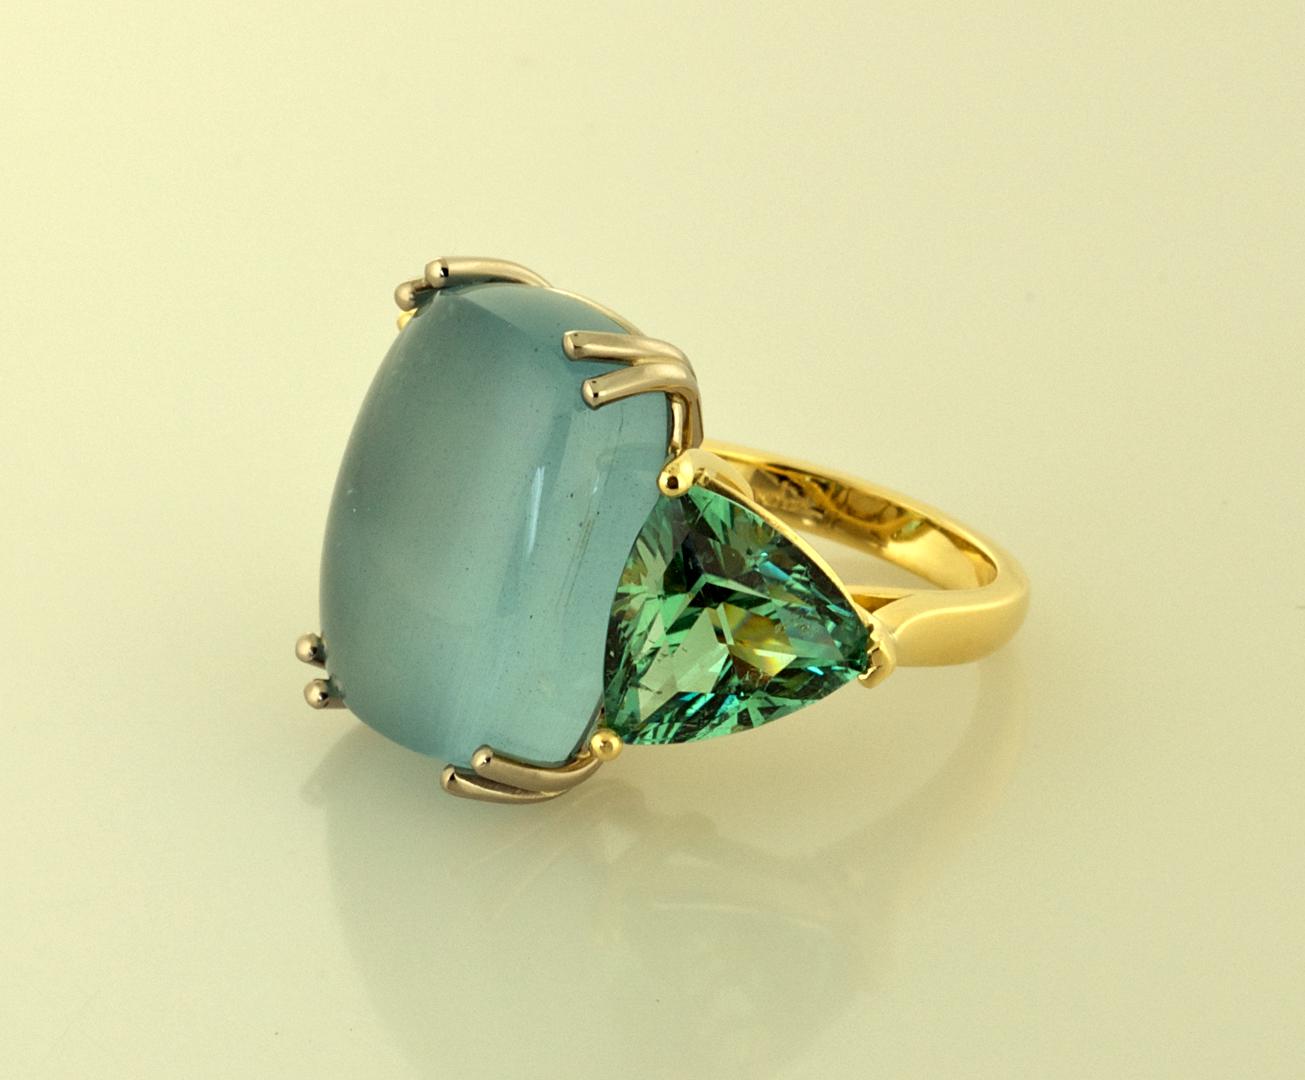 Three Stone RIng Set with Aquamarine and Green Tourmaline | Rings ...